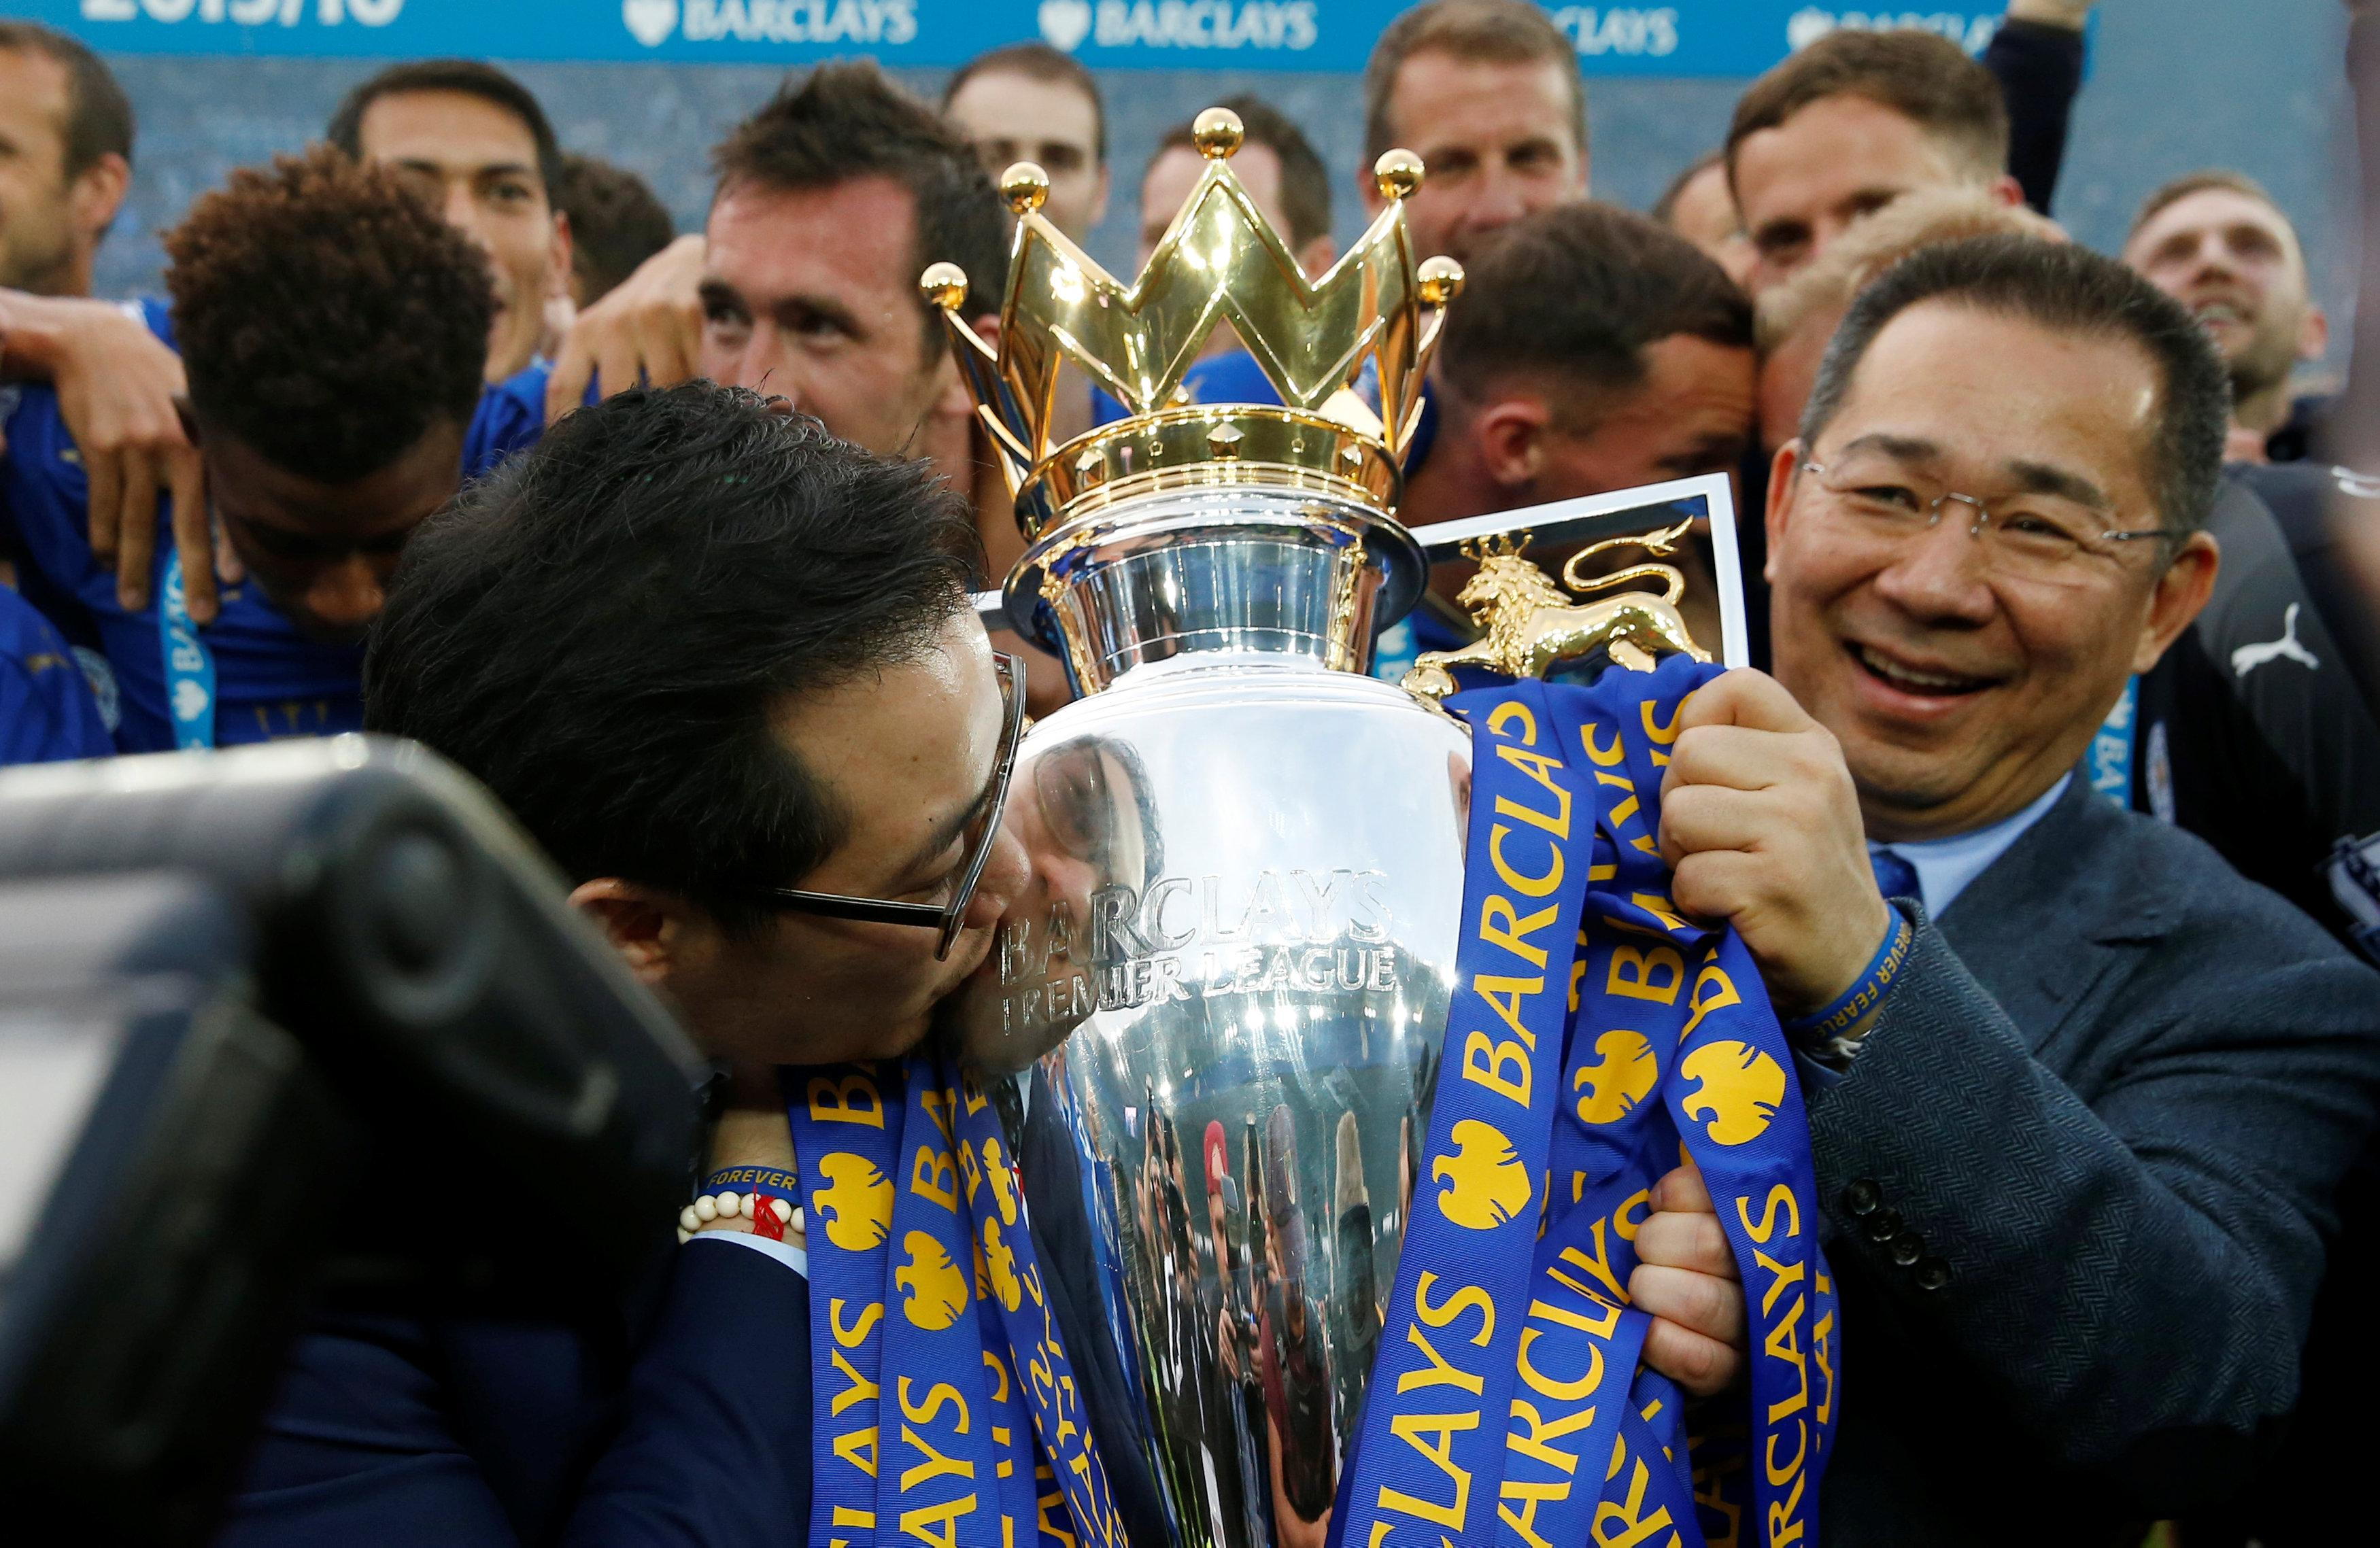 Vichai Srivaddhanaprabha lifting the Premier League trophy in 2016